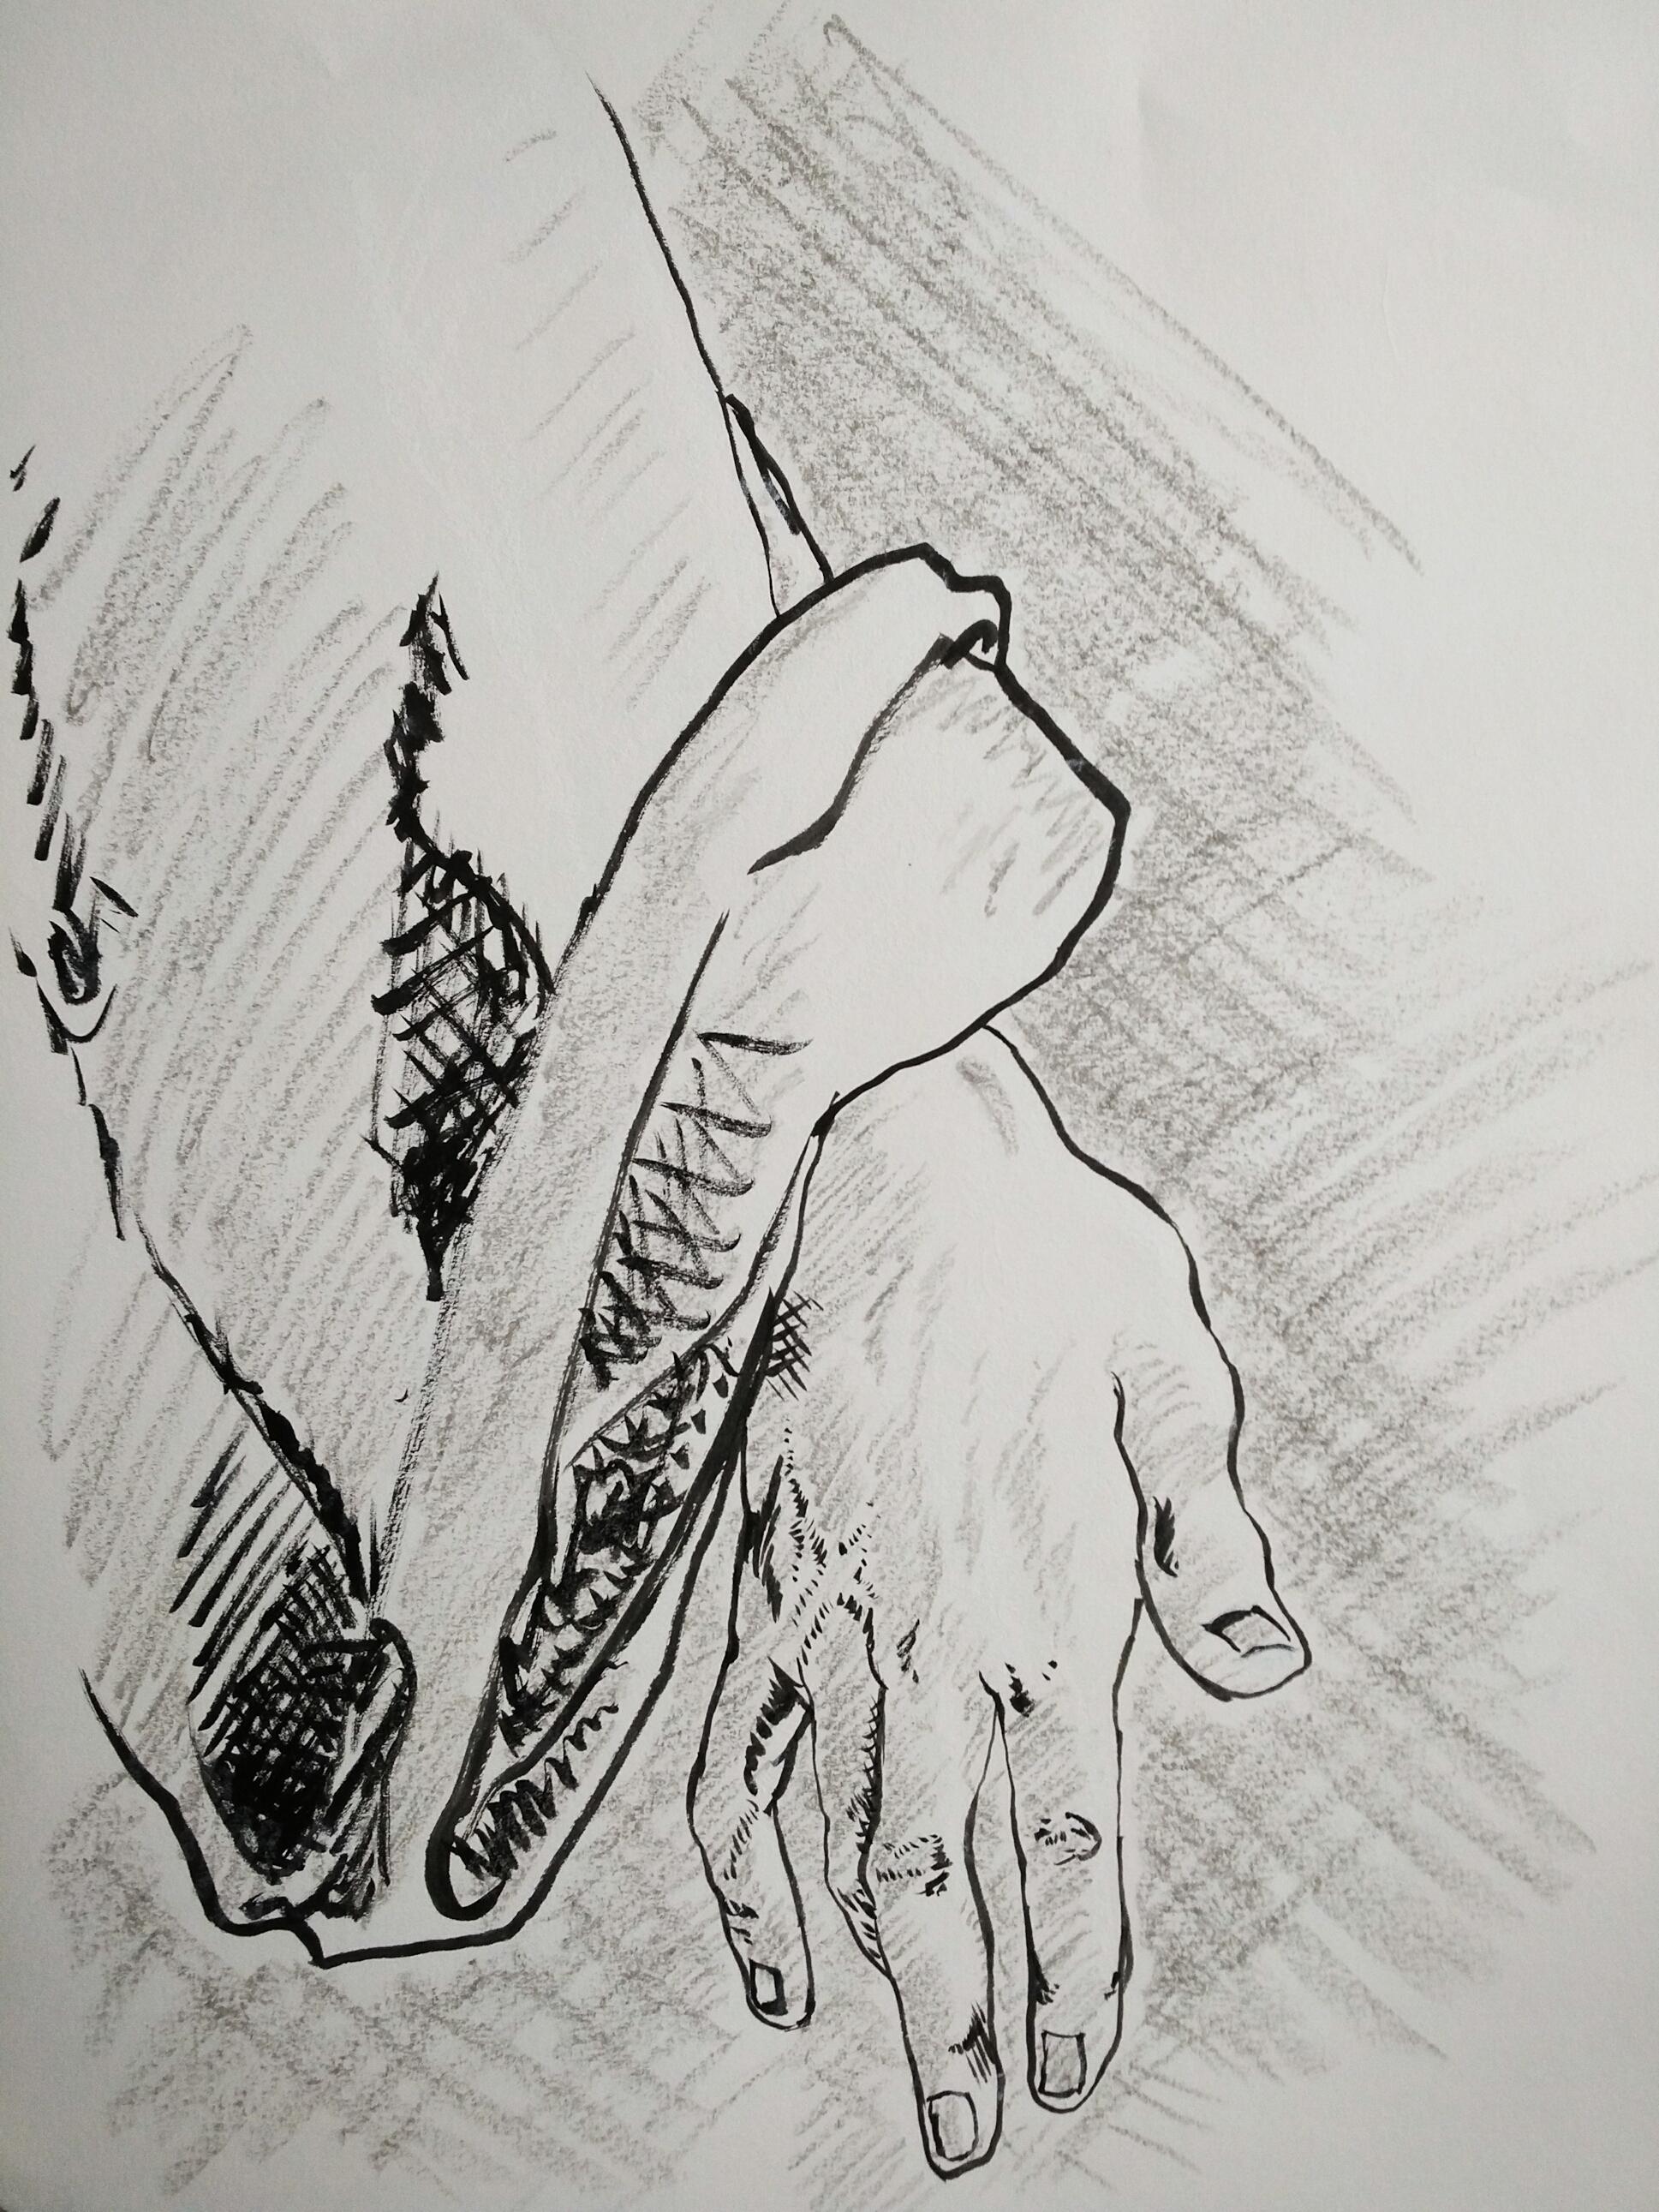 Durer hand